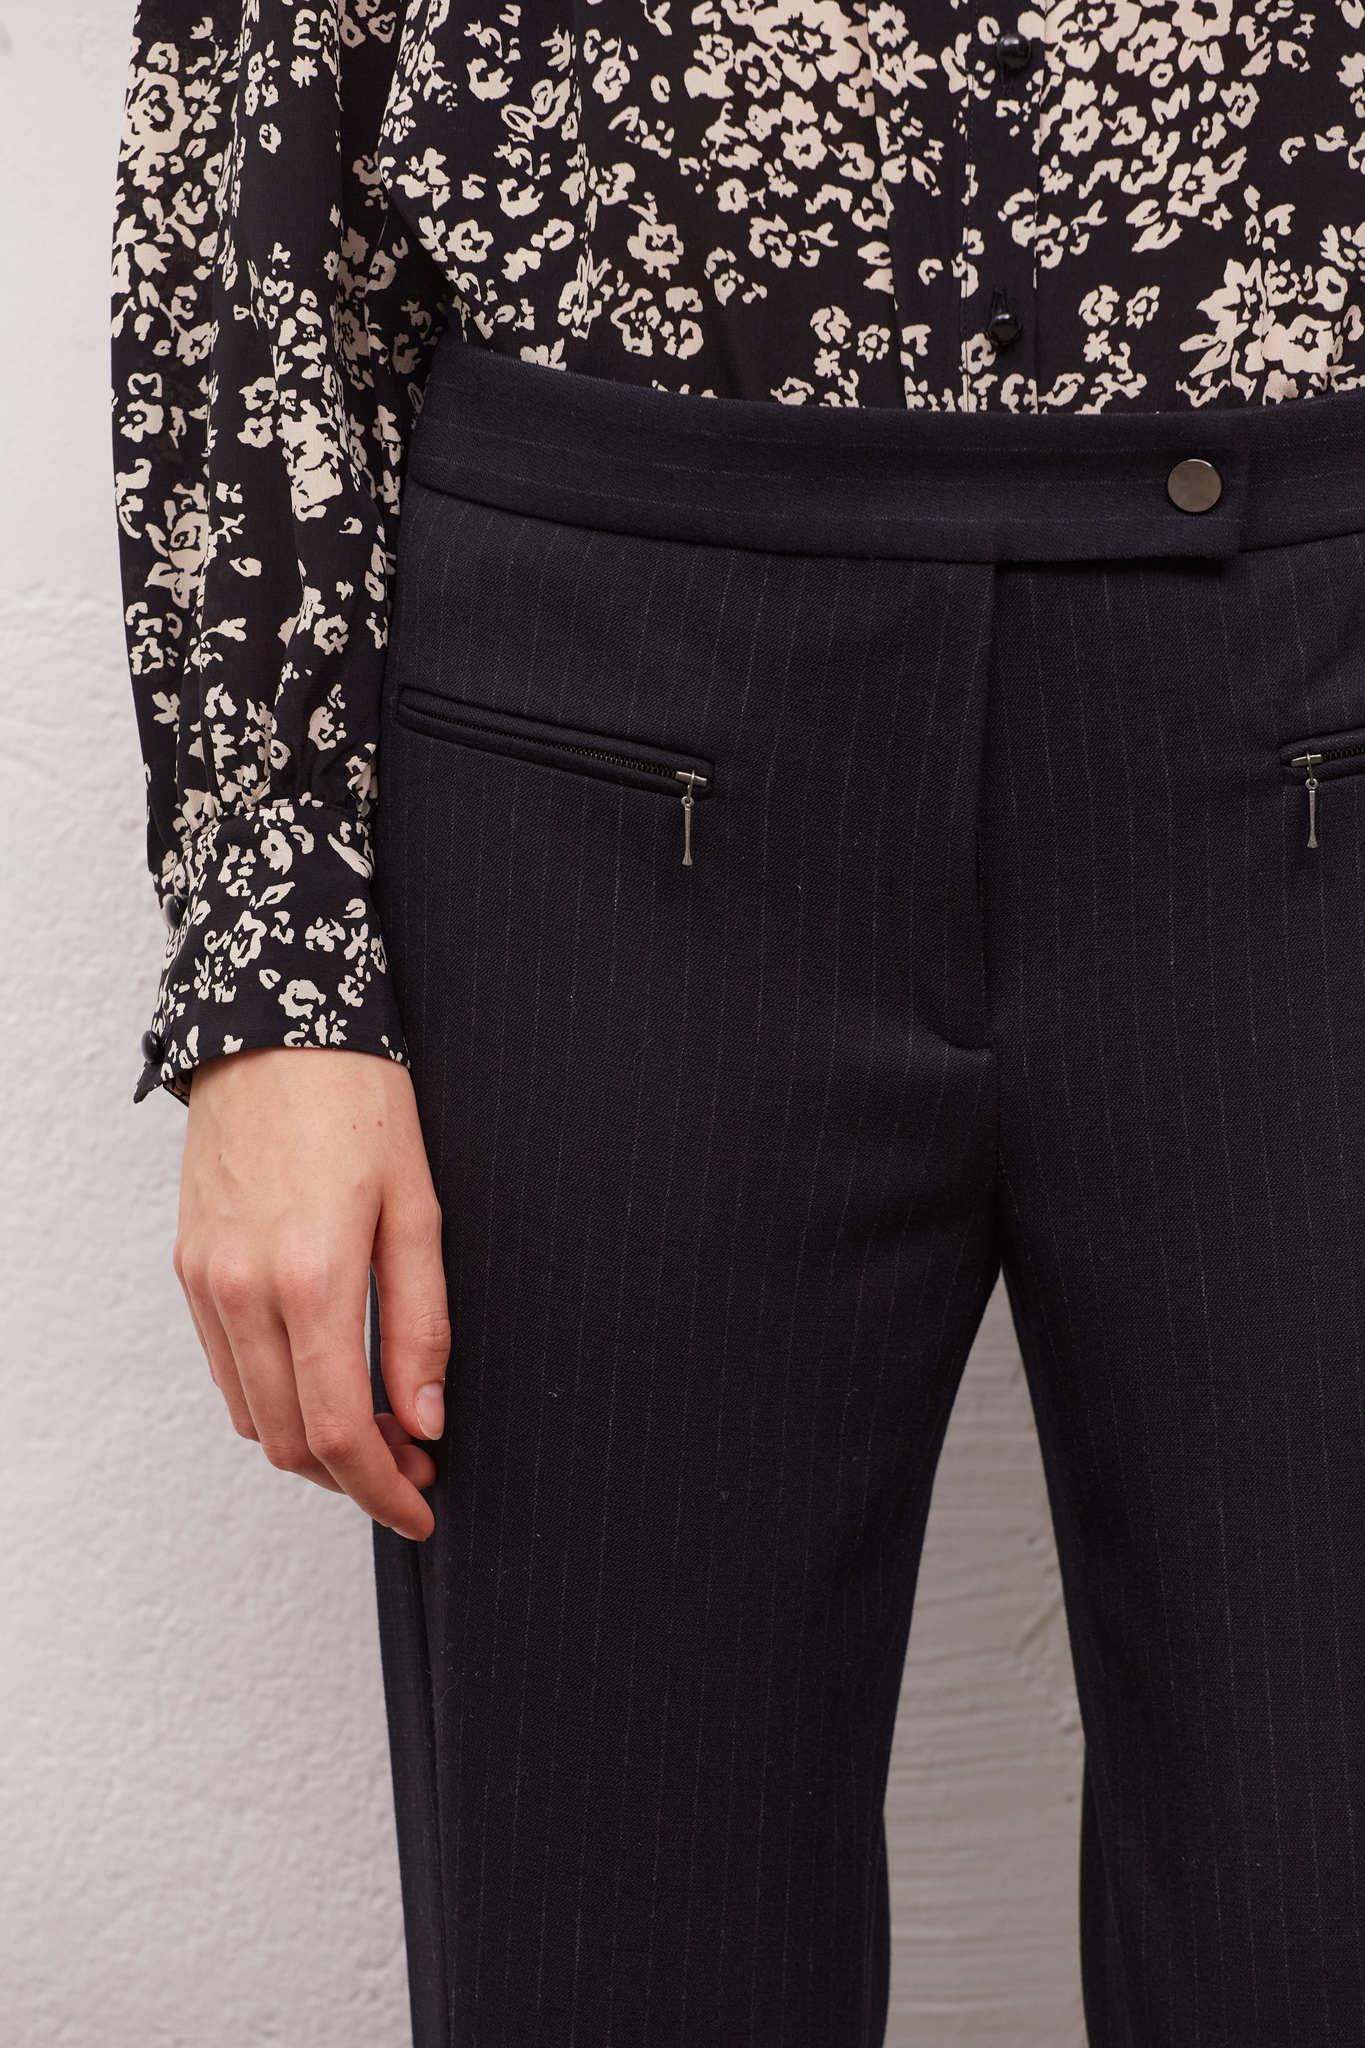 EMIL - Прямые брюки с карманами на молнии